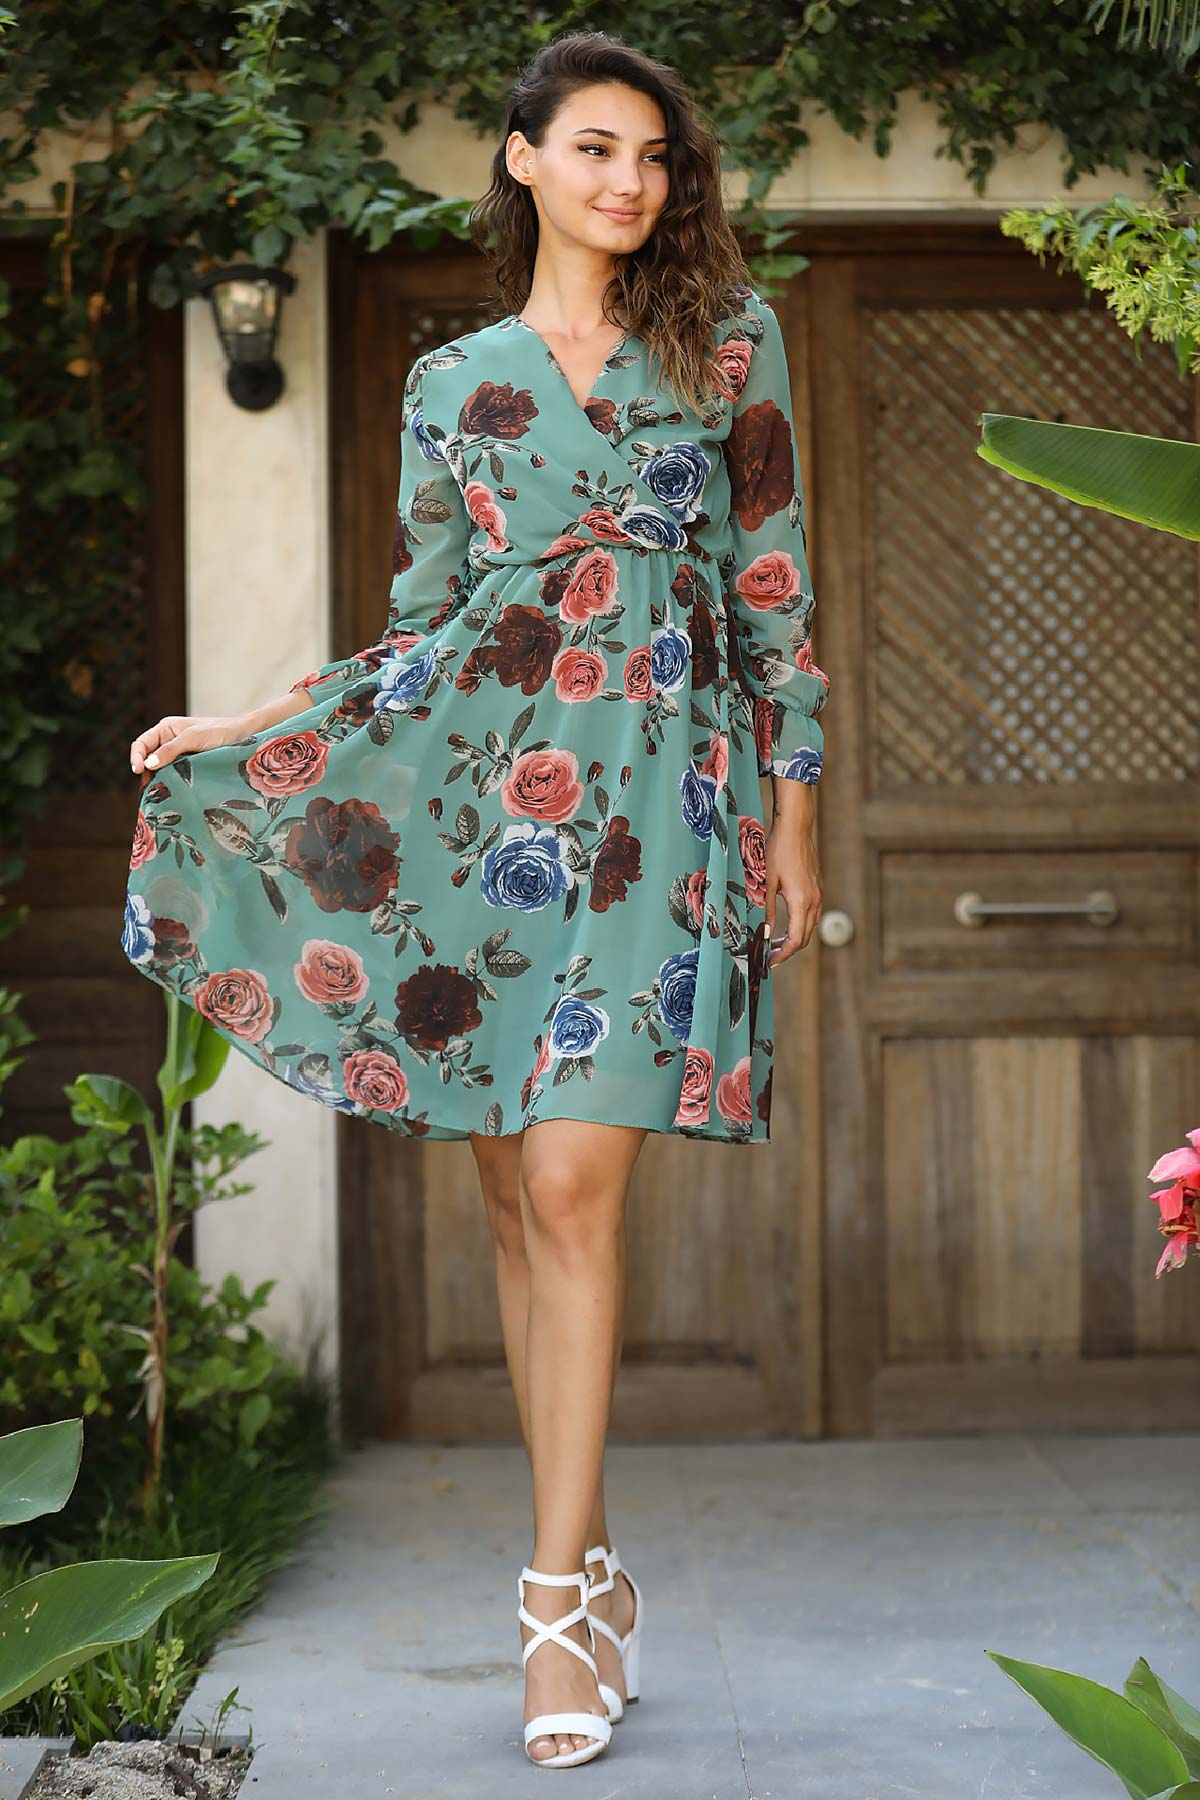 Women's Wrap Patterned Green Chiffon Short Dress